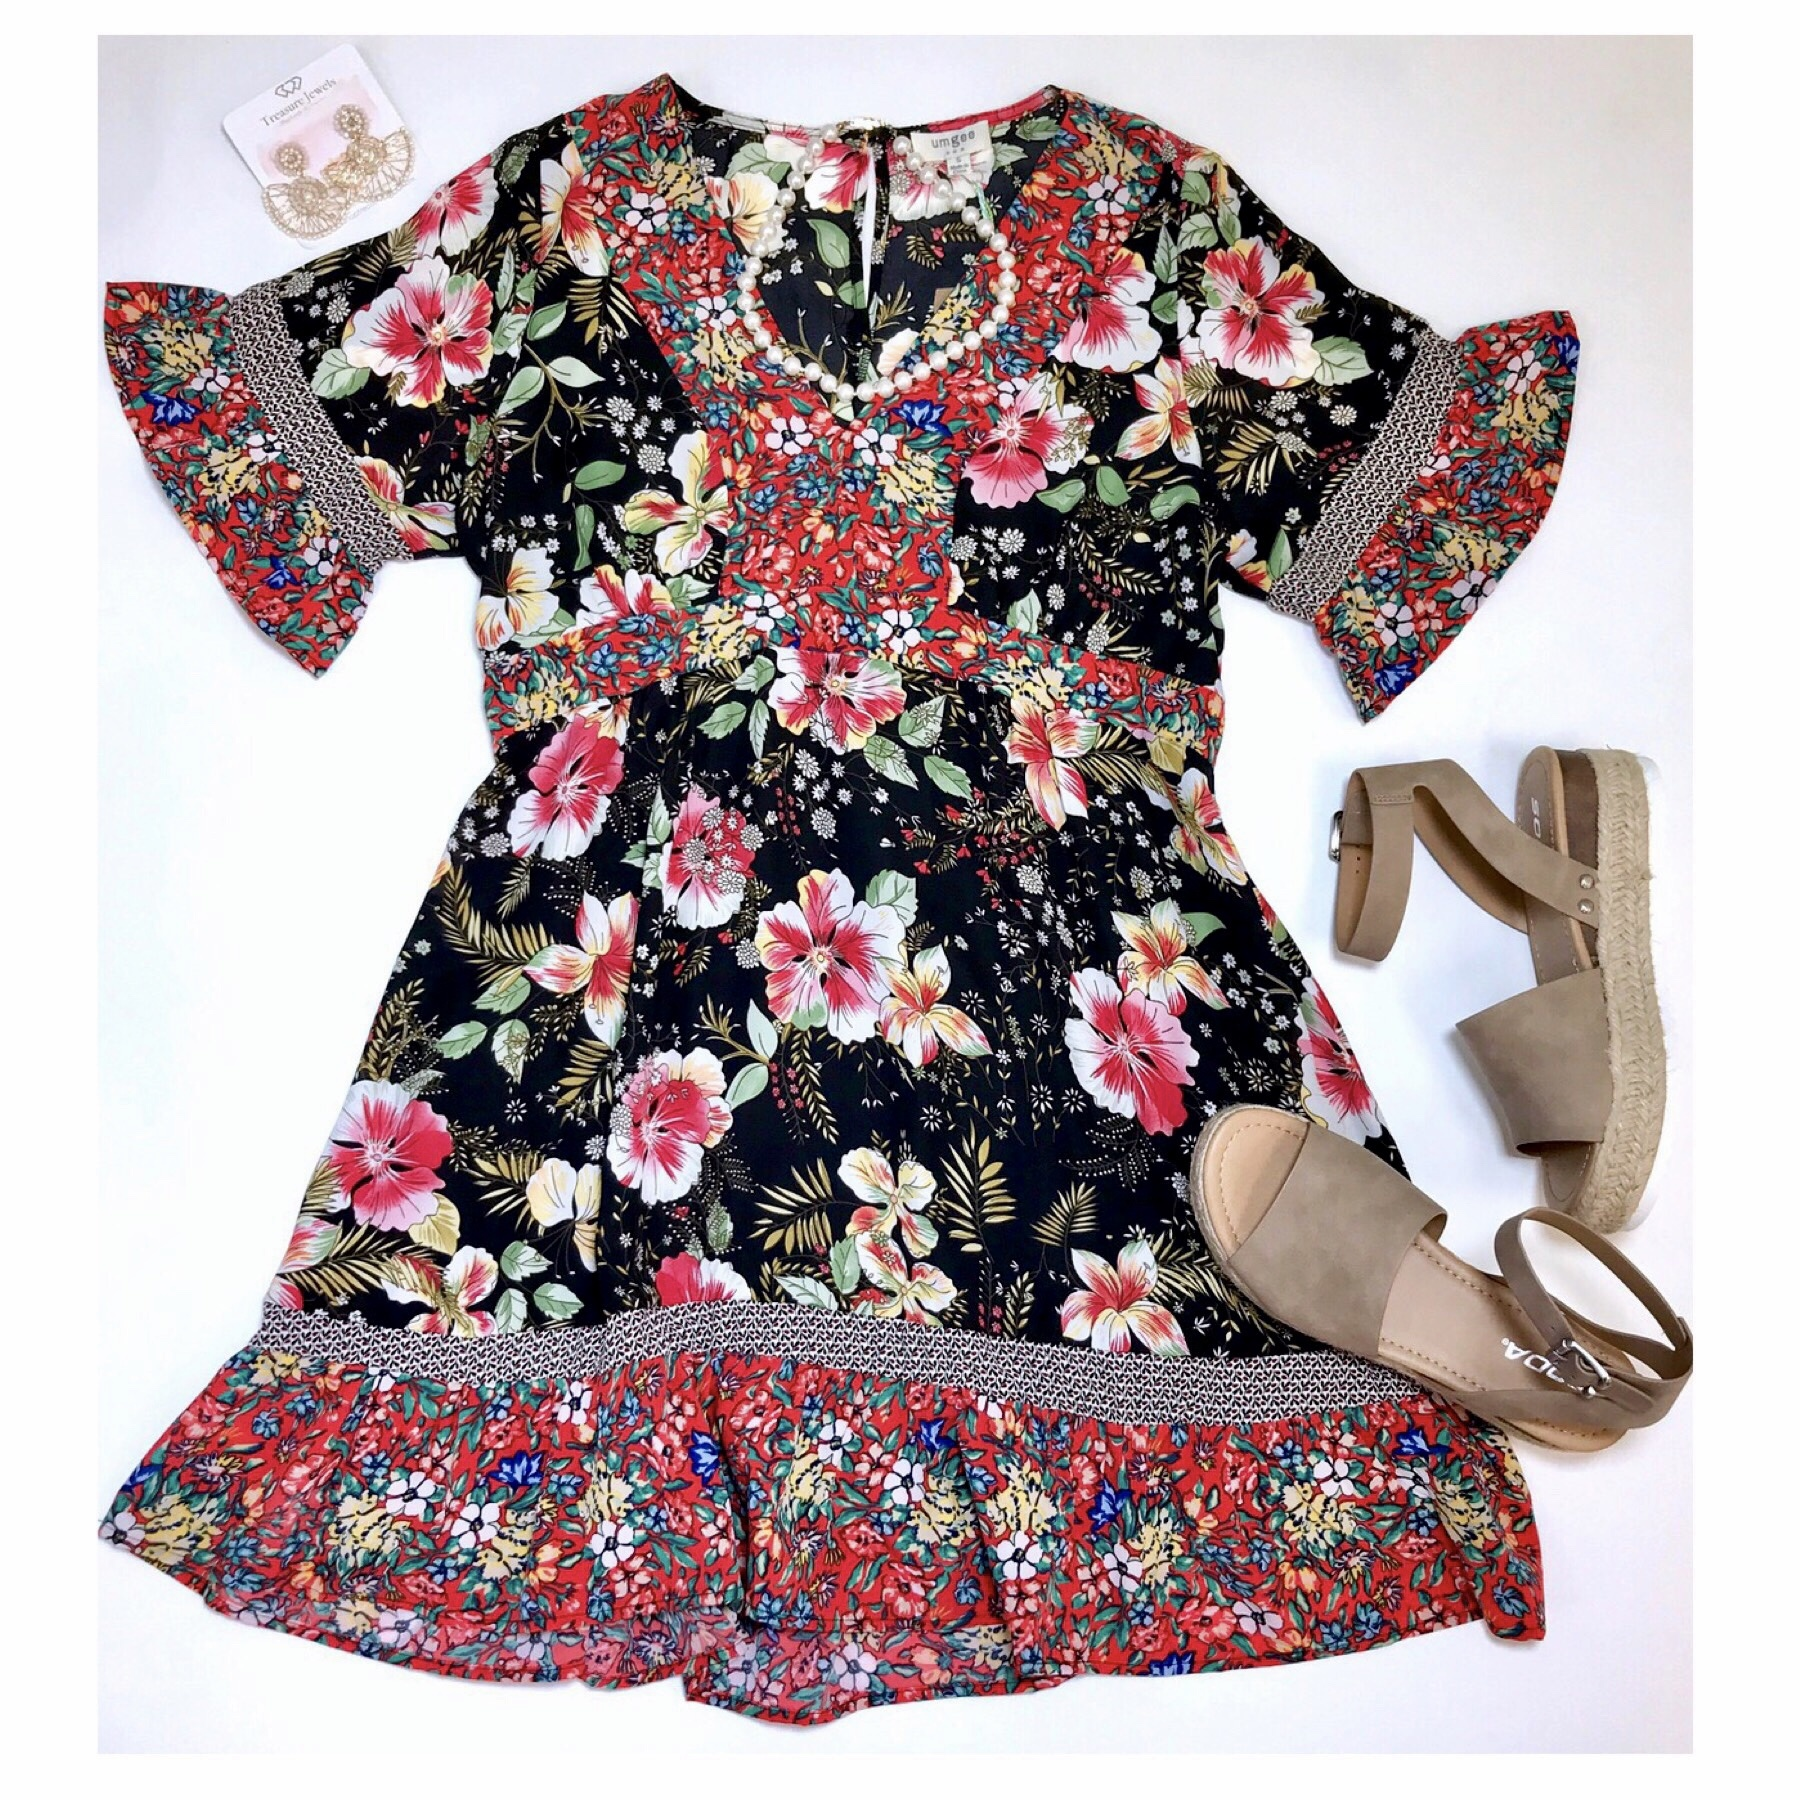 Black Floral Mixed Print V-Neck Dress